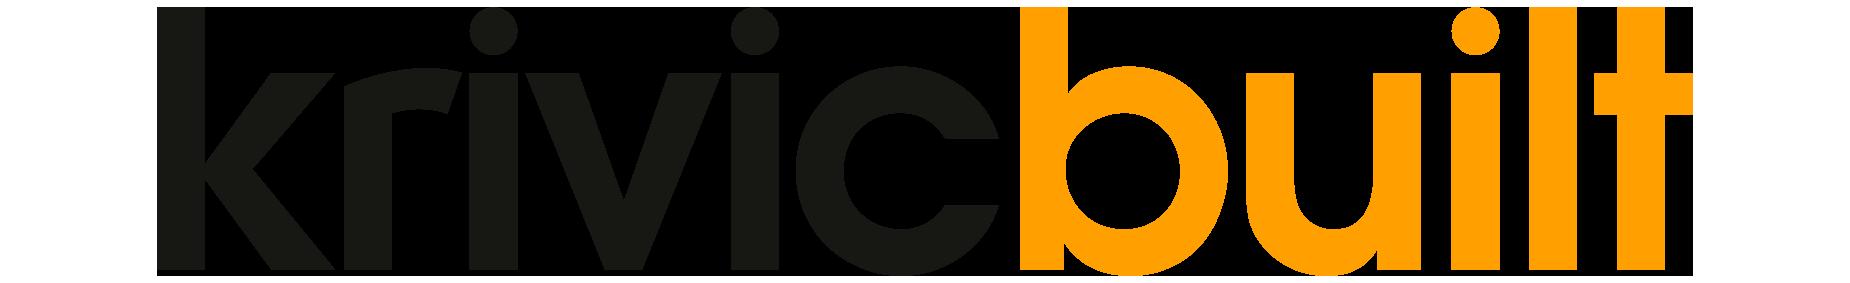 krivic-built-logo-centred.png